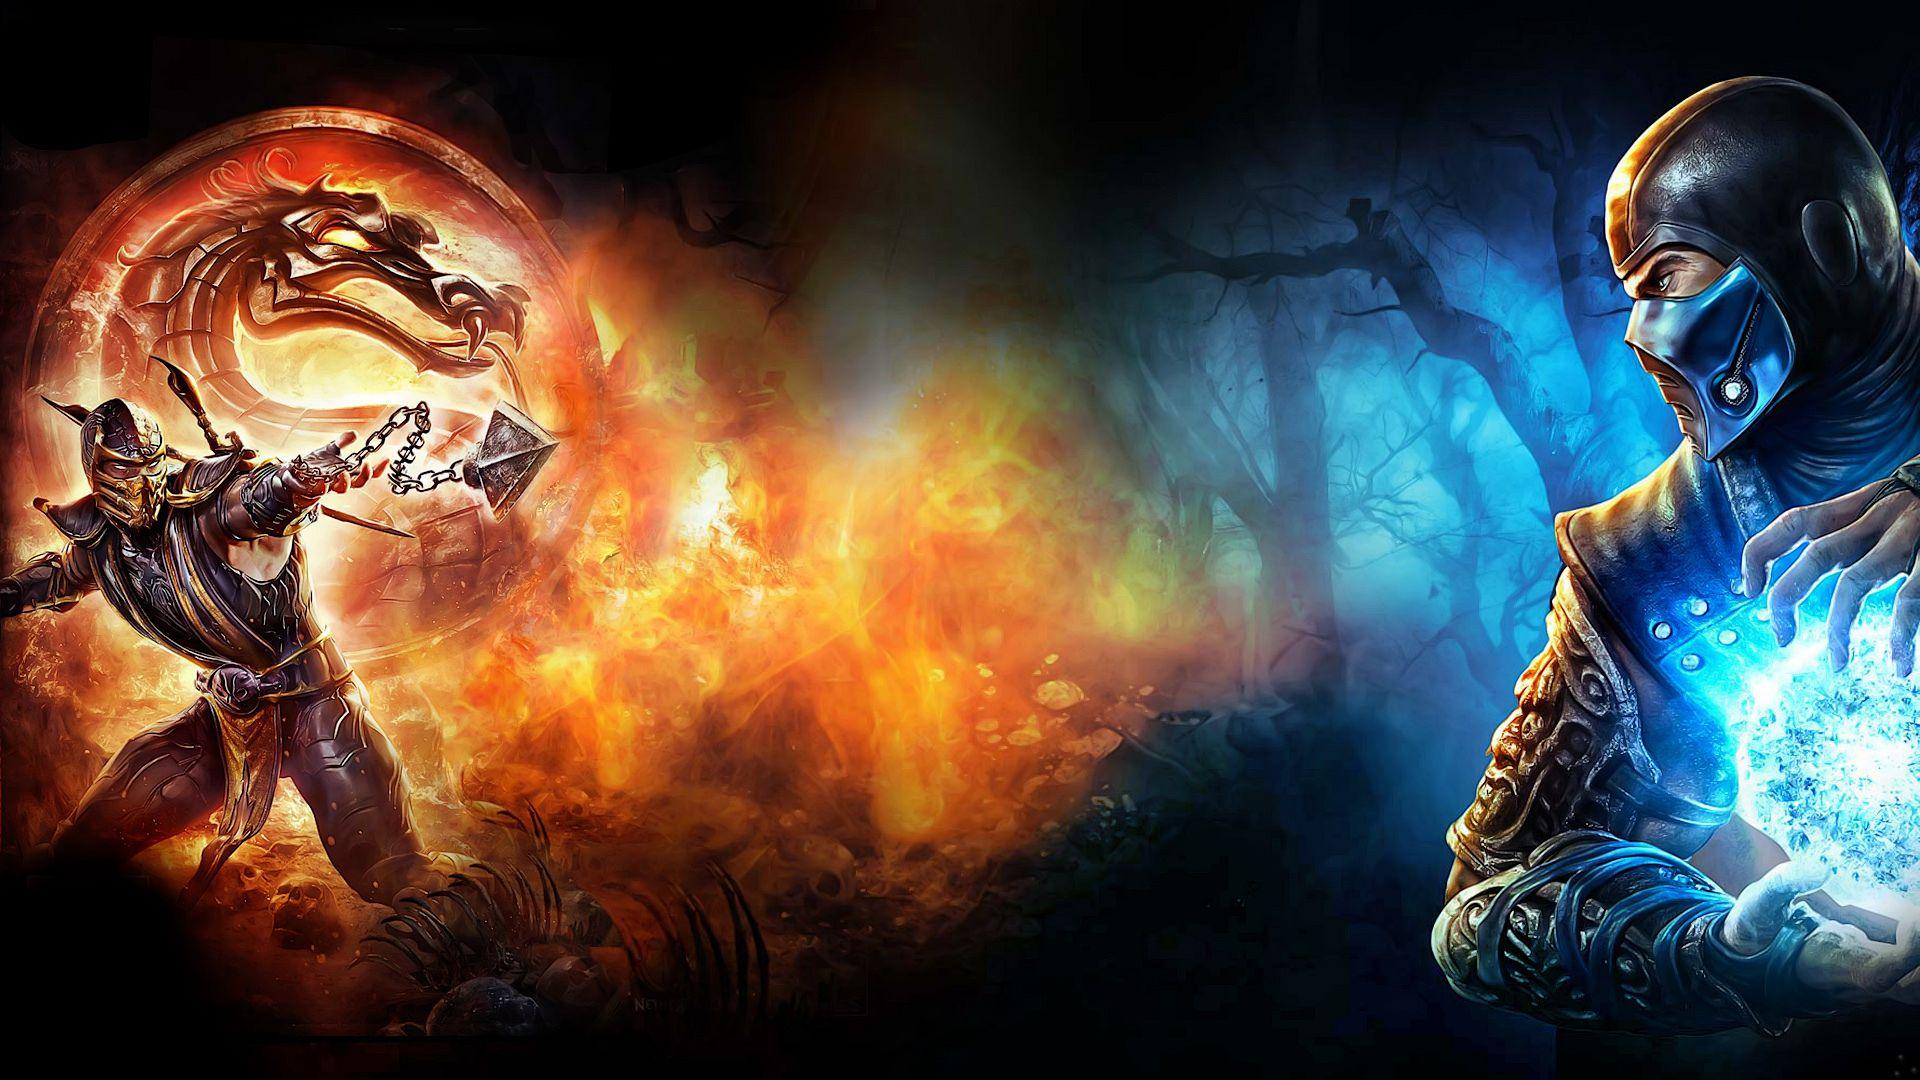 Mortal Kombat HD Wallpapers Backgrounds Wallpaper Mortal